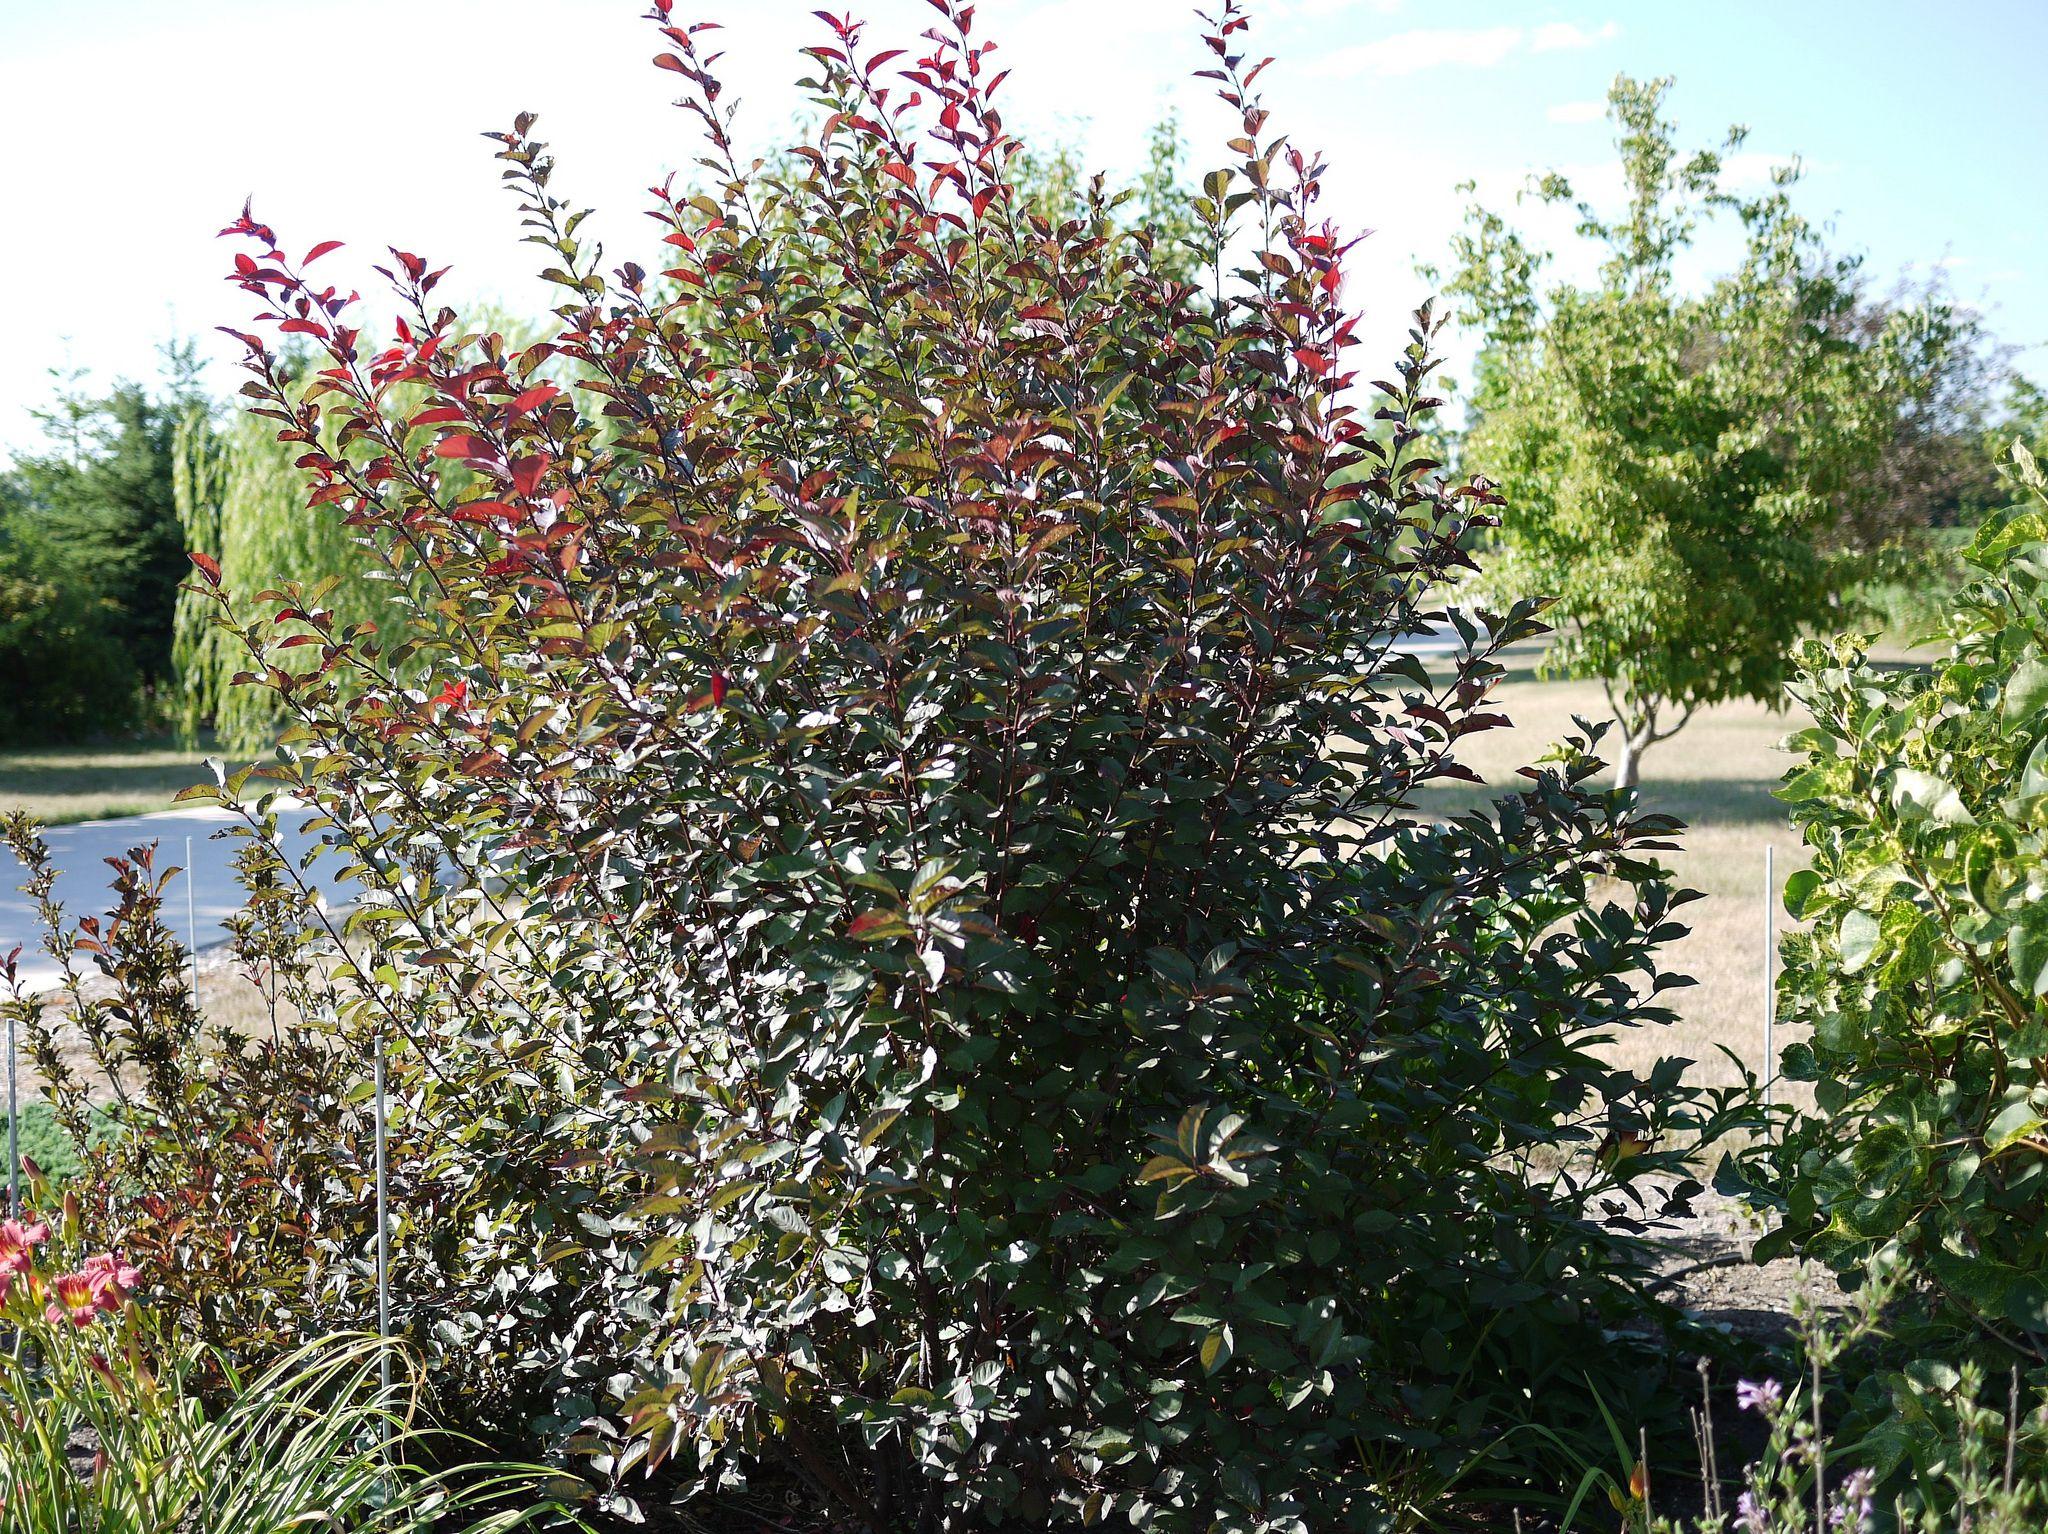 Purple leaf shrub with pink flowers - Purple Leaf Sandcherry Is Valued For Its Reddishpurple Foliage And Pale Pink Blooms Purple